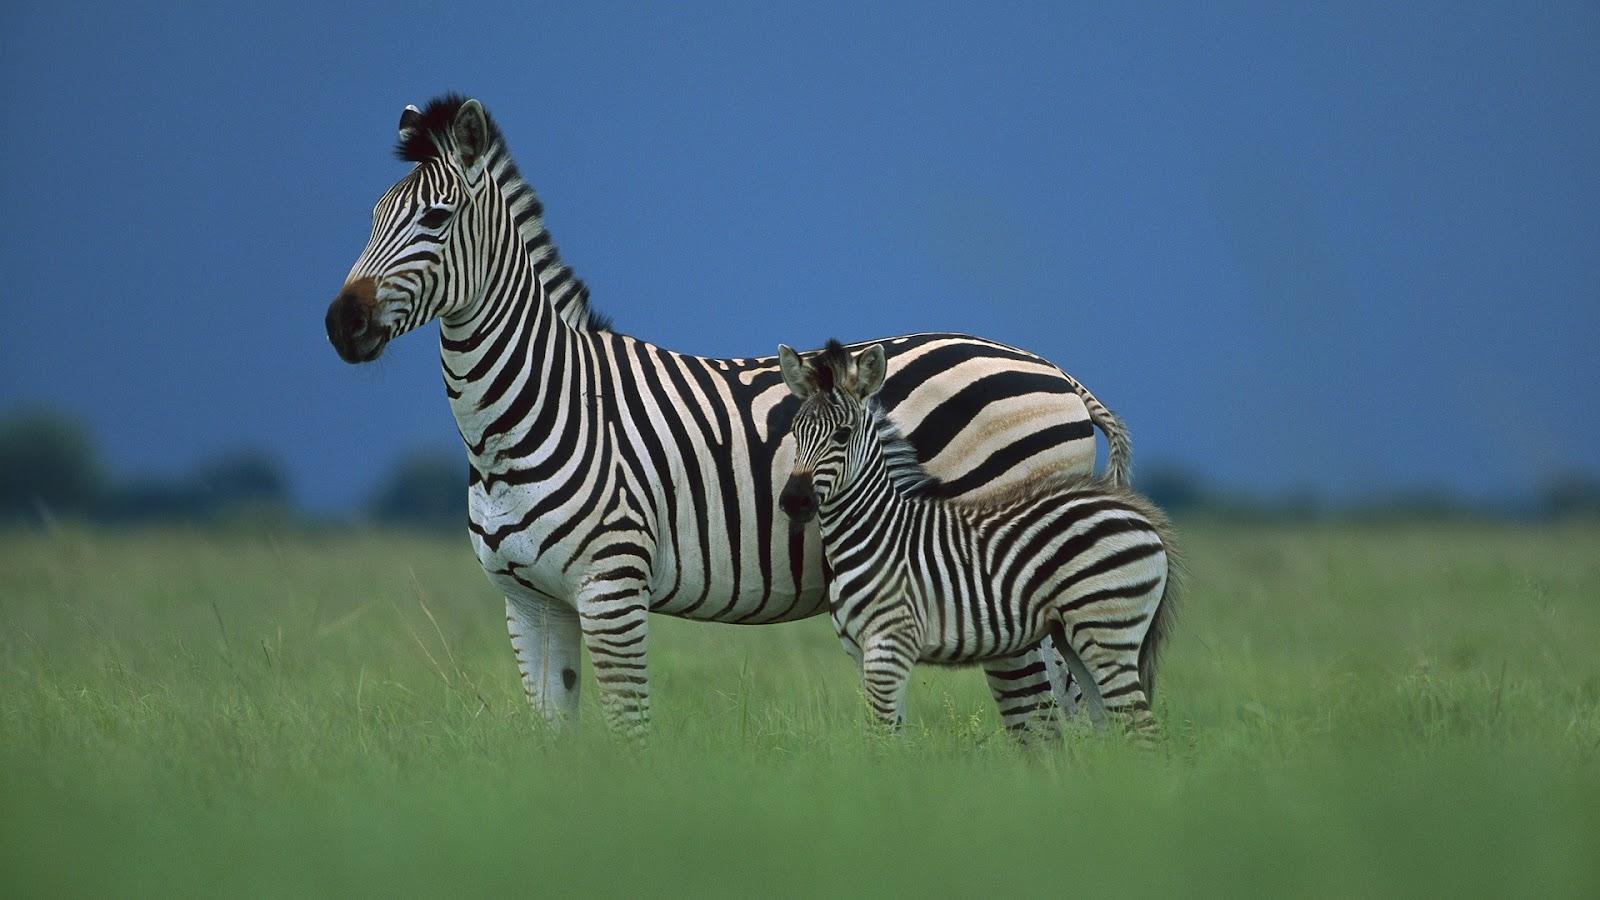 http://3.bp.blogspot.com/-5MyO5w-D6_M/UDXFD1O4PLI/AAAAAAAAGvU/cKzMK535G3c/s1600/Zebra+hd+wallpapers.jpg